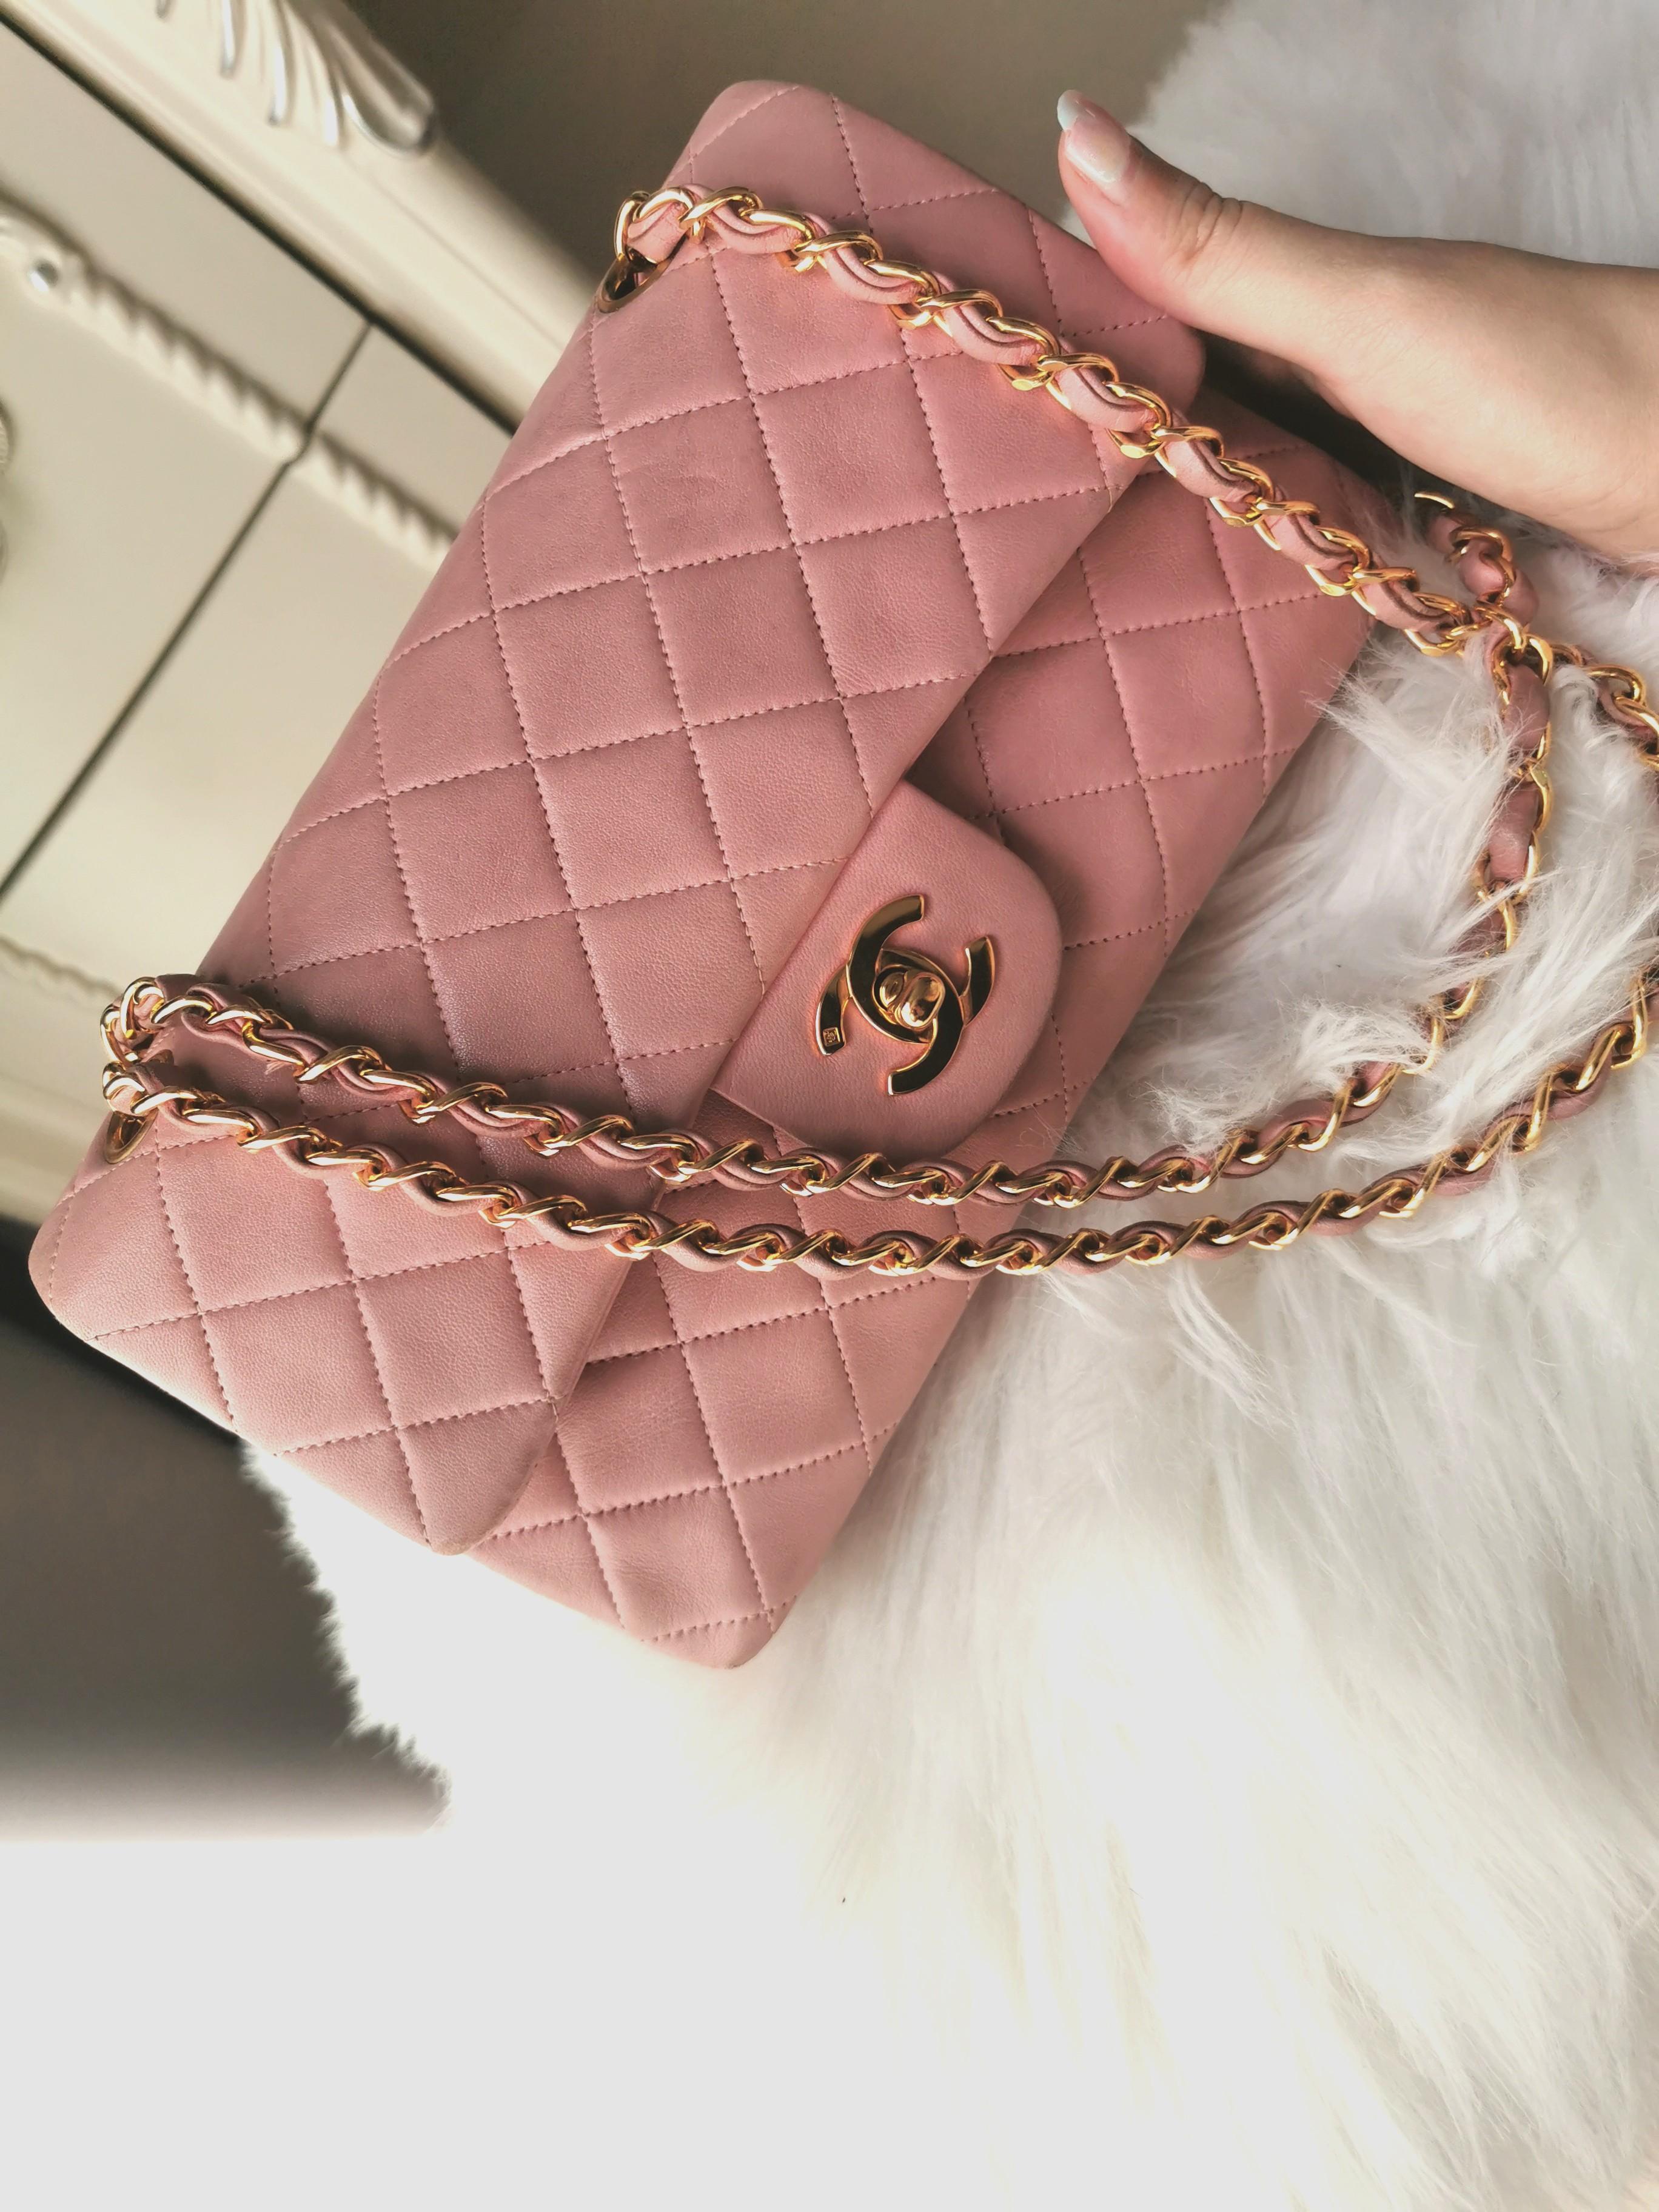 Pink Chanel Bag Luxury Bags